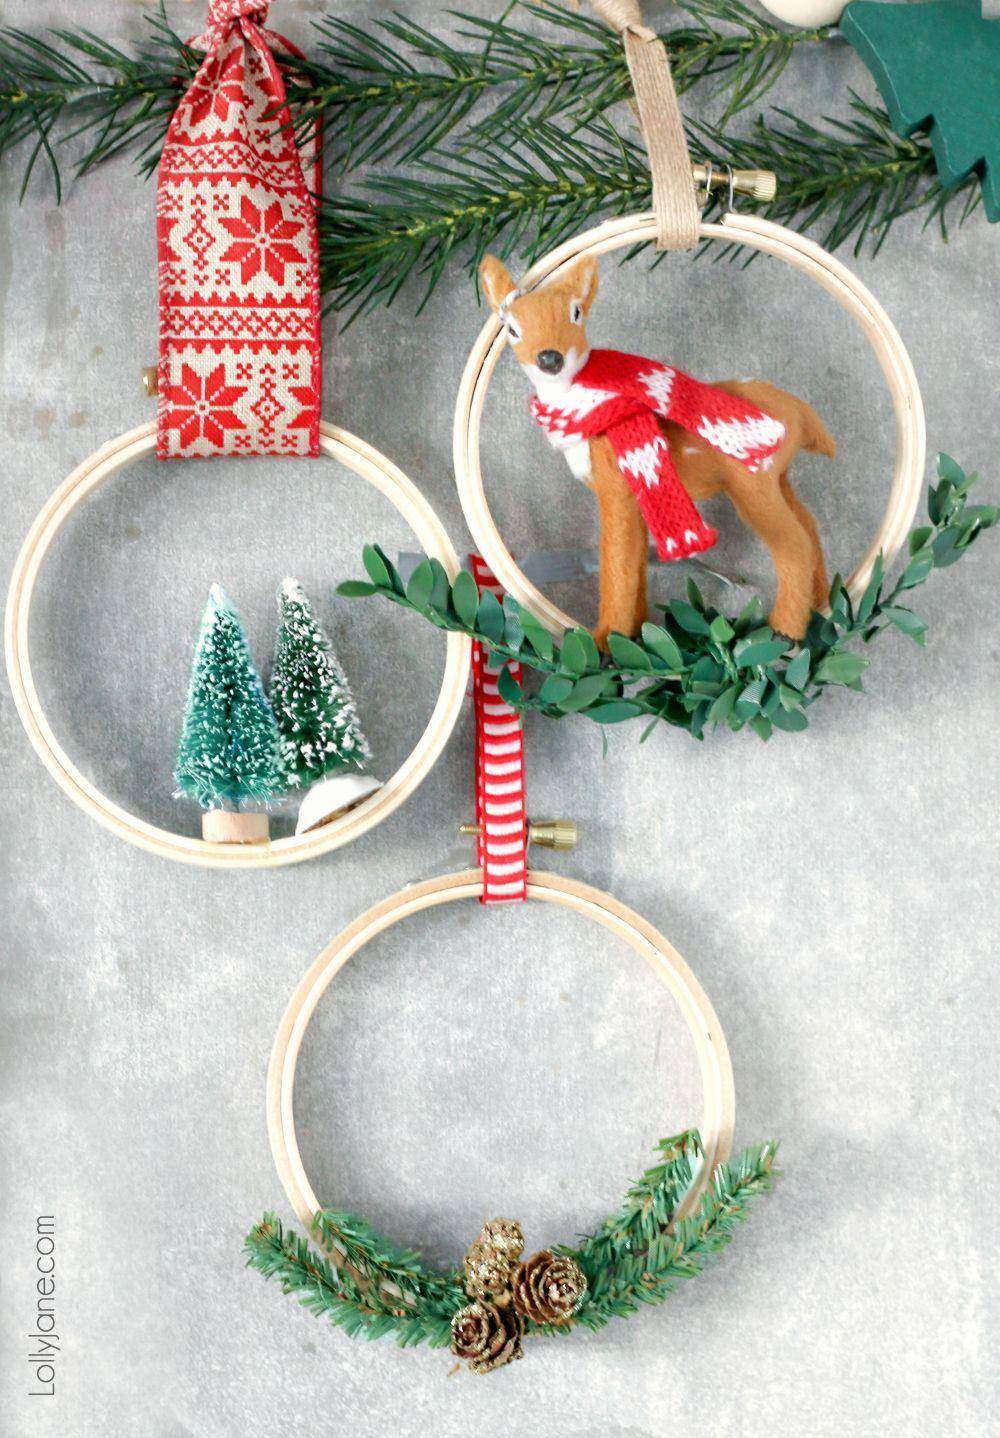 Easy Embroidery Hoop Christmas Ornaments Lolly Jane Easy Christmas Diy Diy Christmas Ornaments Christmas Decor Diy